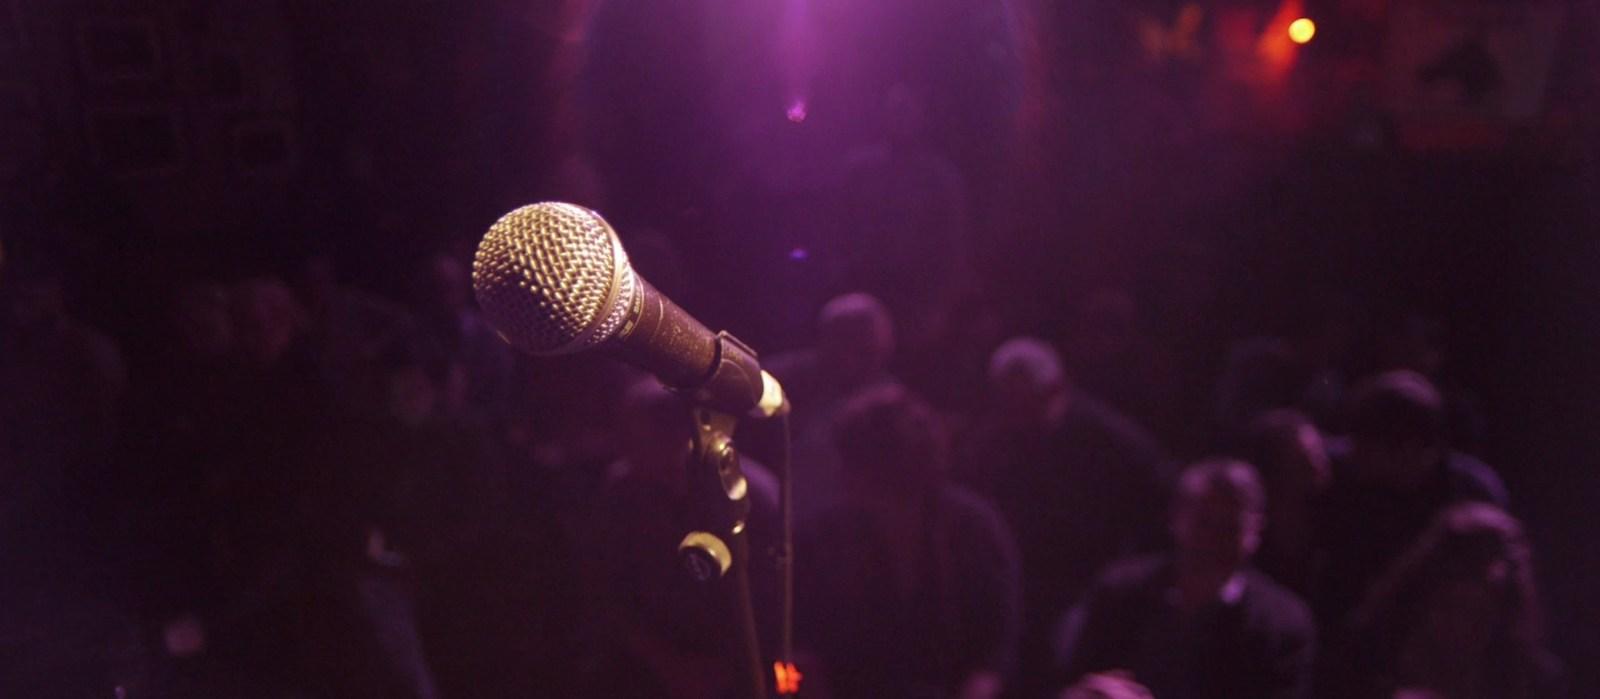 Microphone-Whealans1